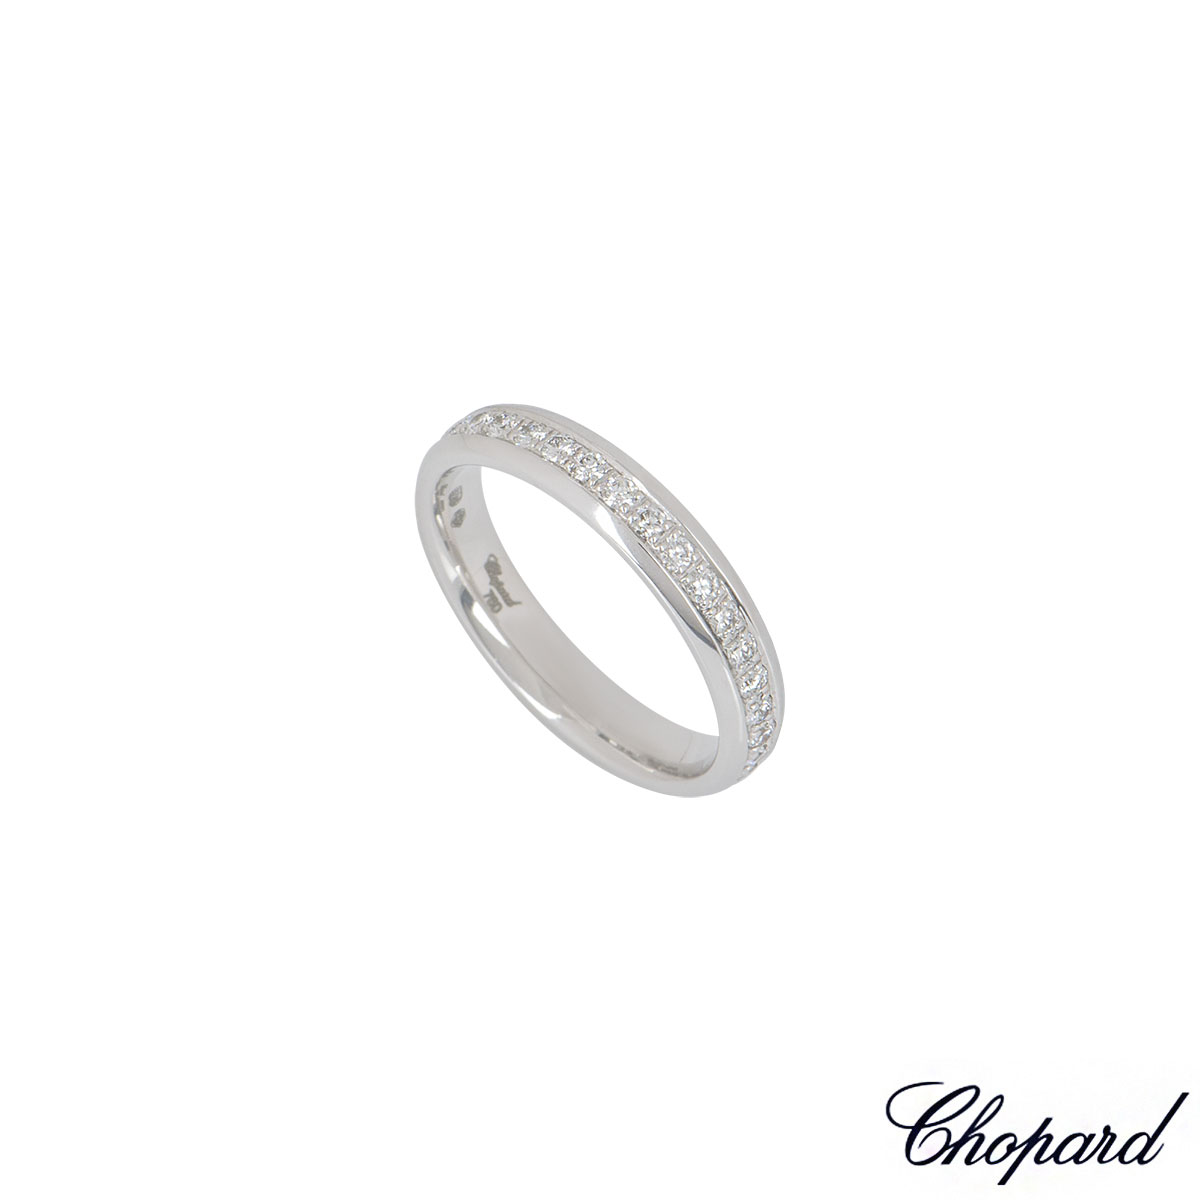 Chopard White Gold Diamond Eternity Band 827331-1107